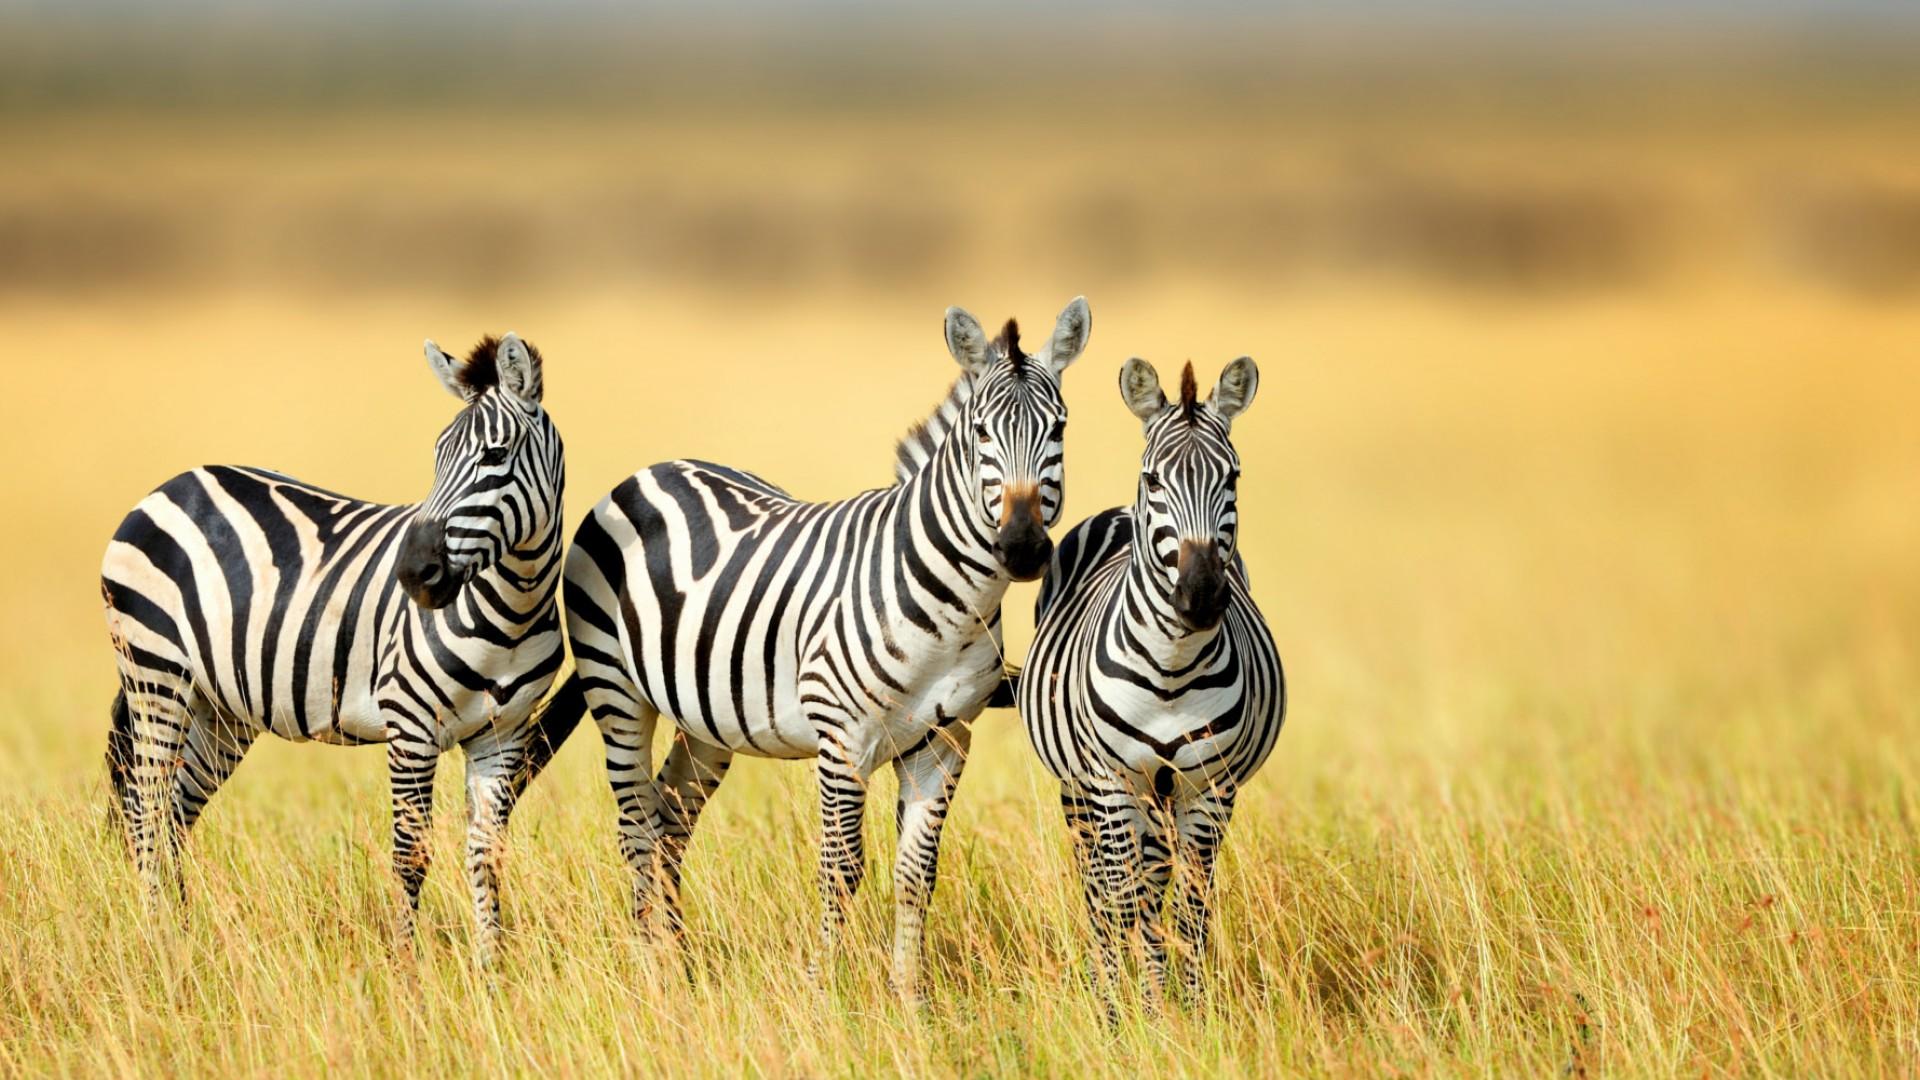 zebras in south africa